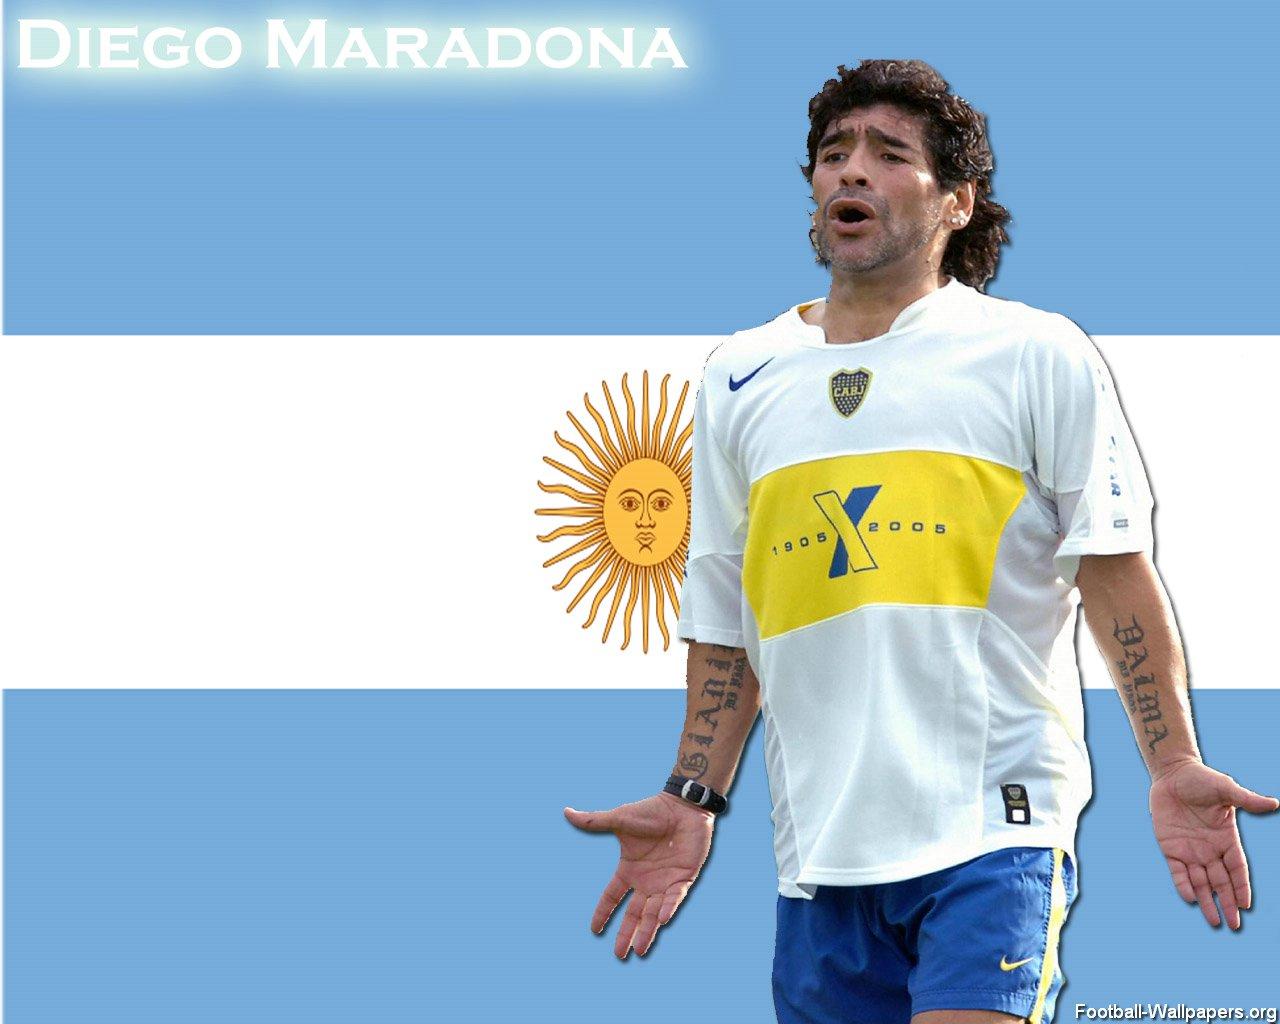 http://3.bp.blogspot.com/-1xC5GTSOmTk/T8jDON0cxOI/AAAAAAAAD2A/UOxRBB0fXHw/s1600/Diego+Maradona+HD+Wallpapers+02.jpg